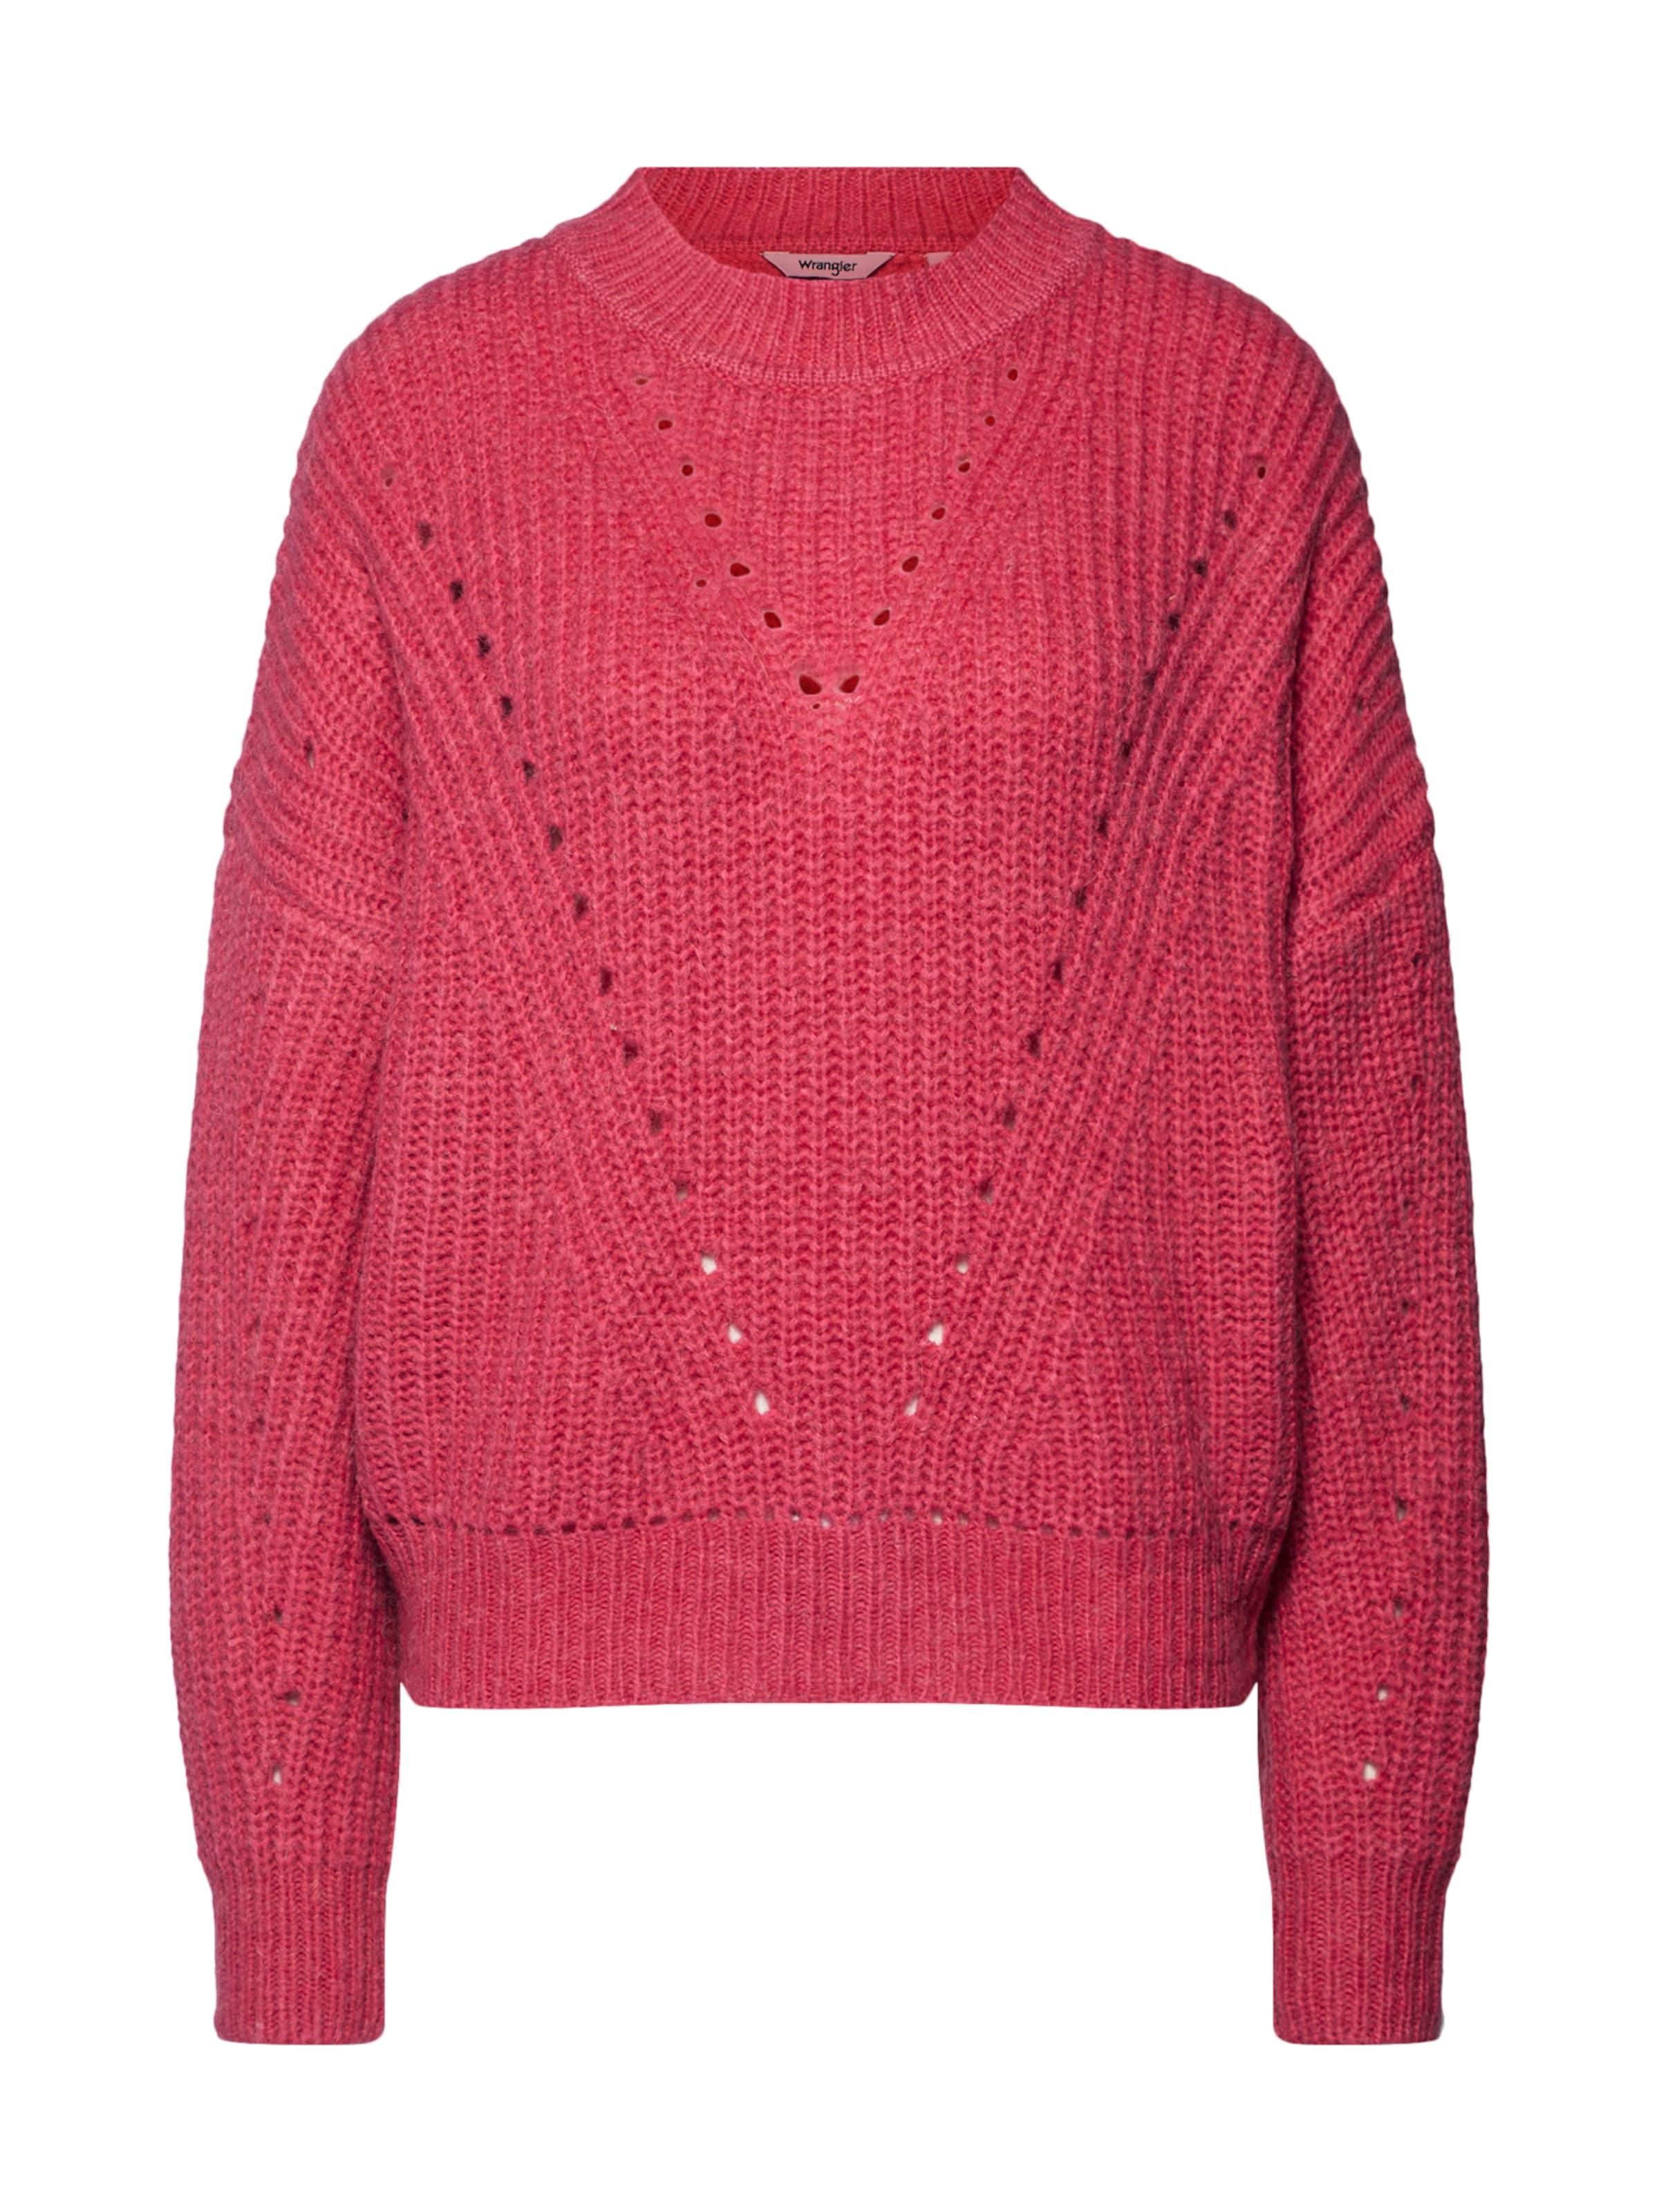 Pullover Himbeer Wrangler In Wrangler Pullover In zSMqUVp